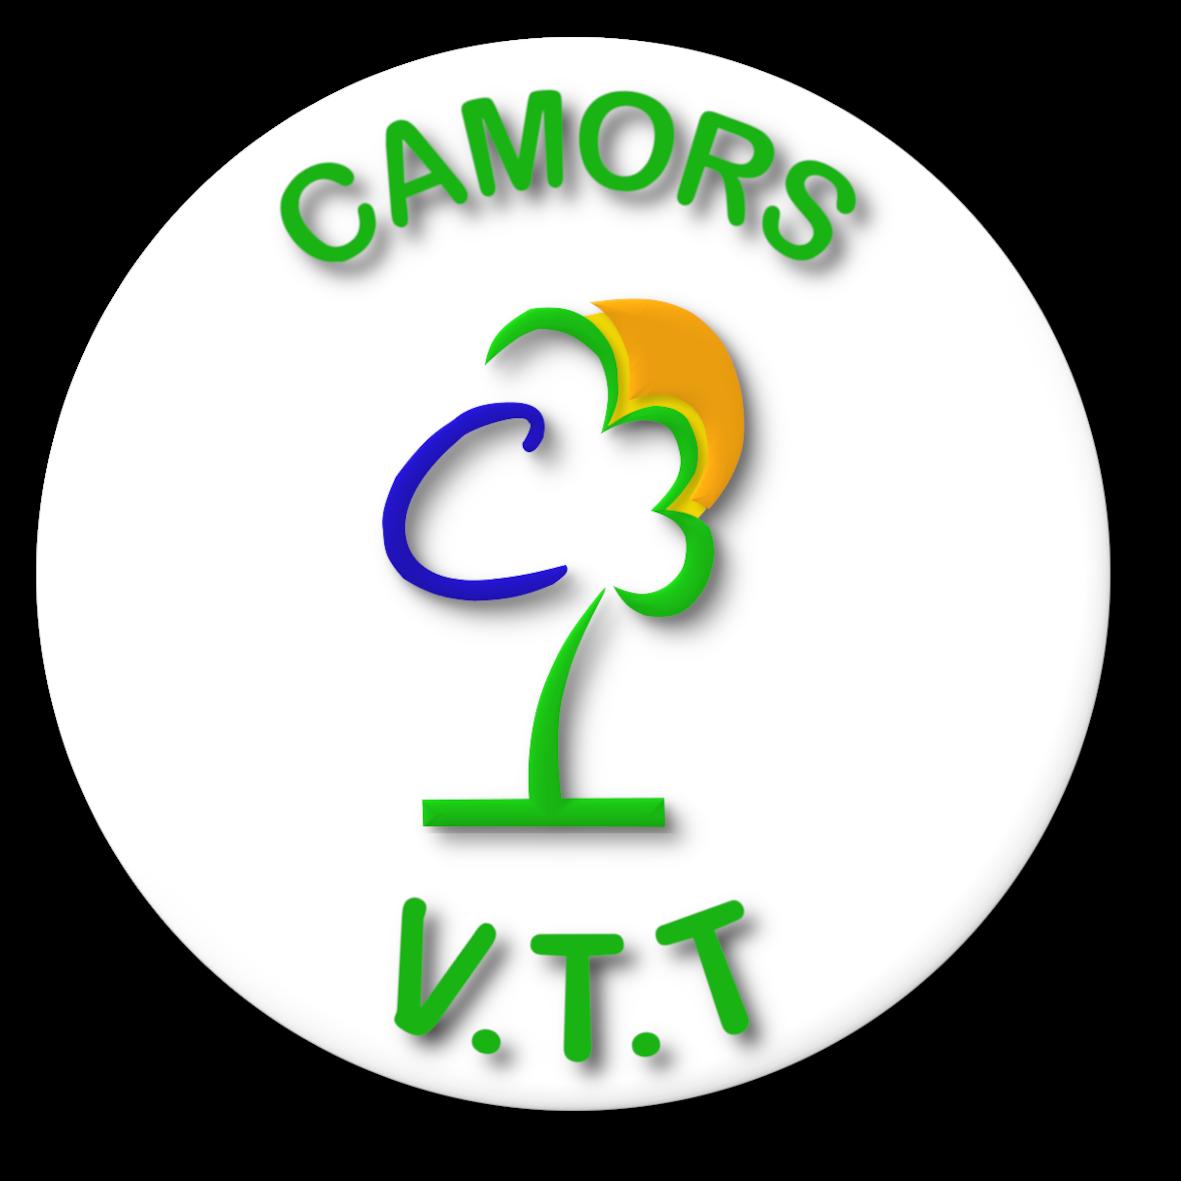 camors VTT.png